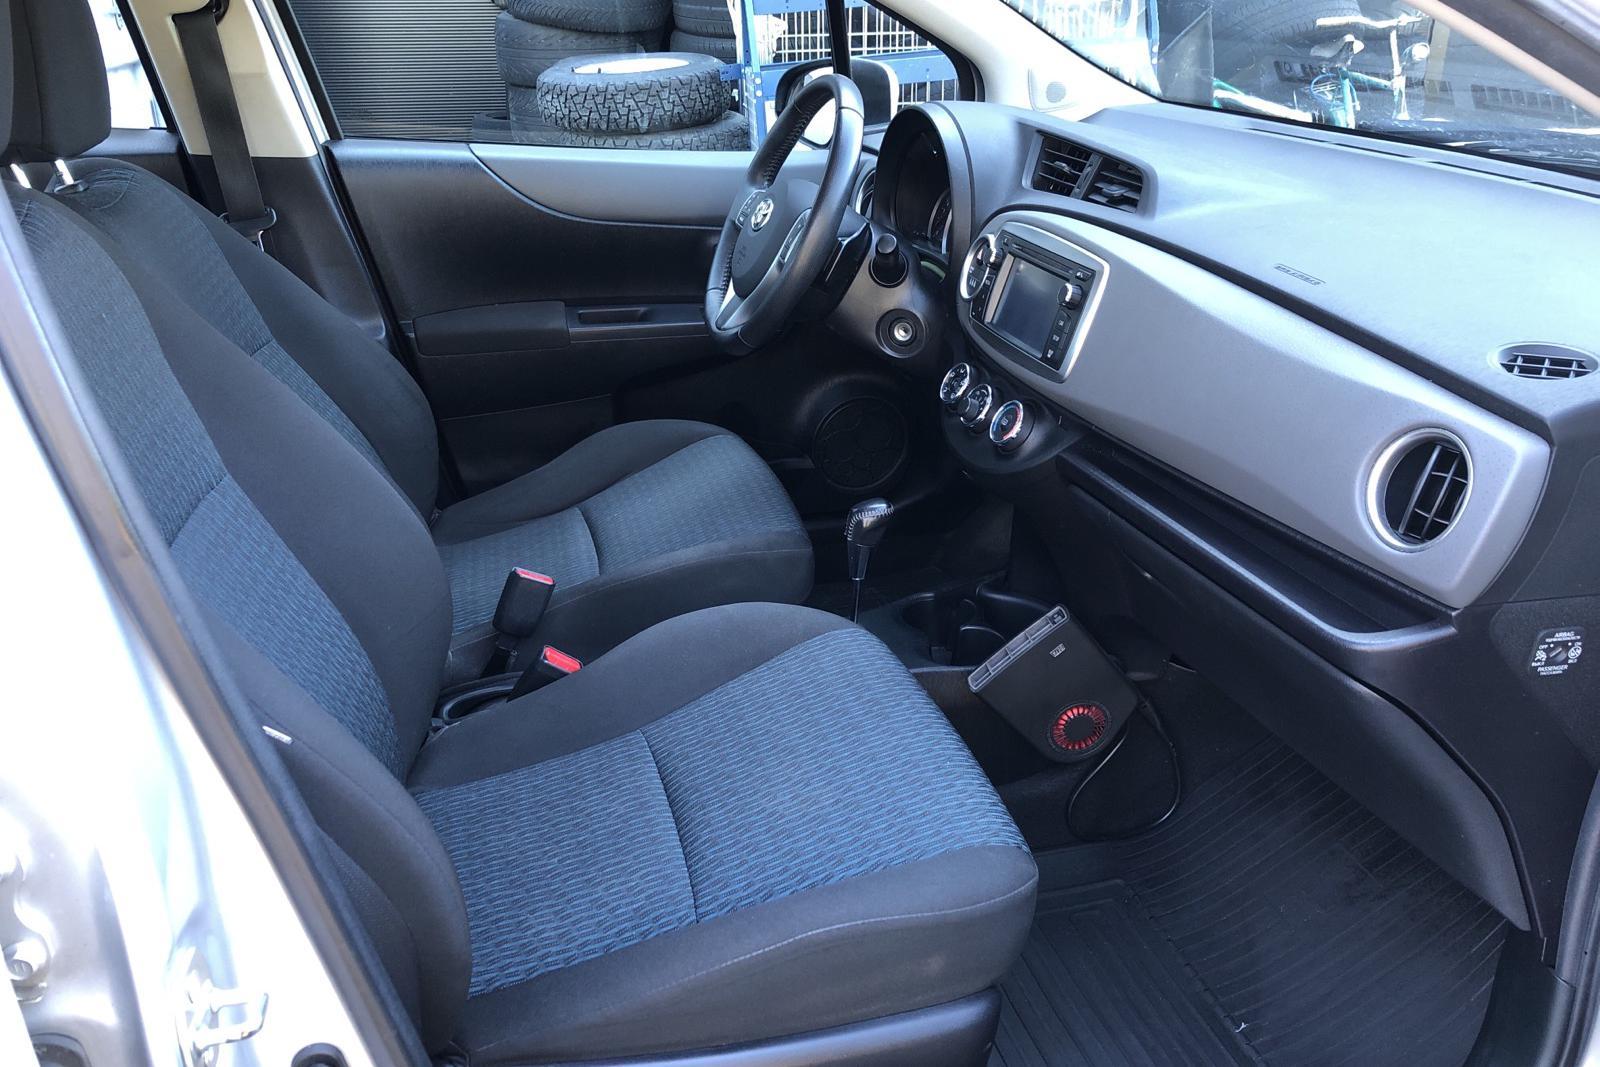 Toyota Yaris 1.33 5dr (100hk) - 9 151 mil - Automat - silver - 2013